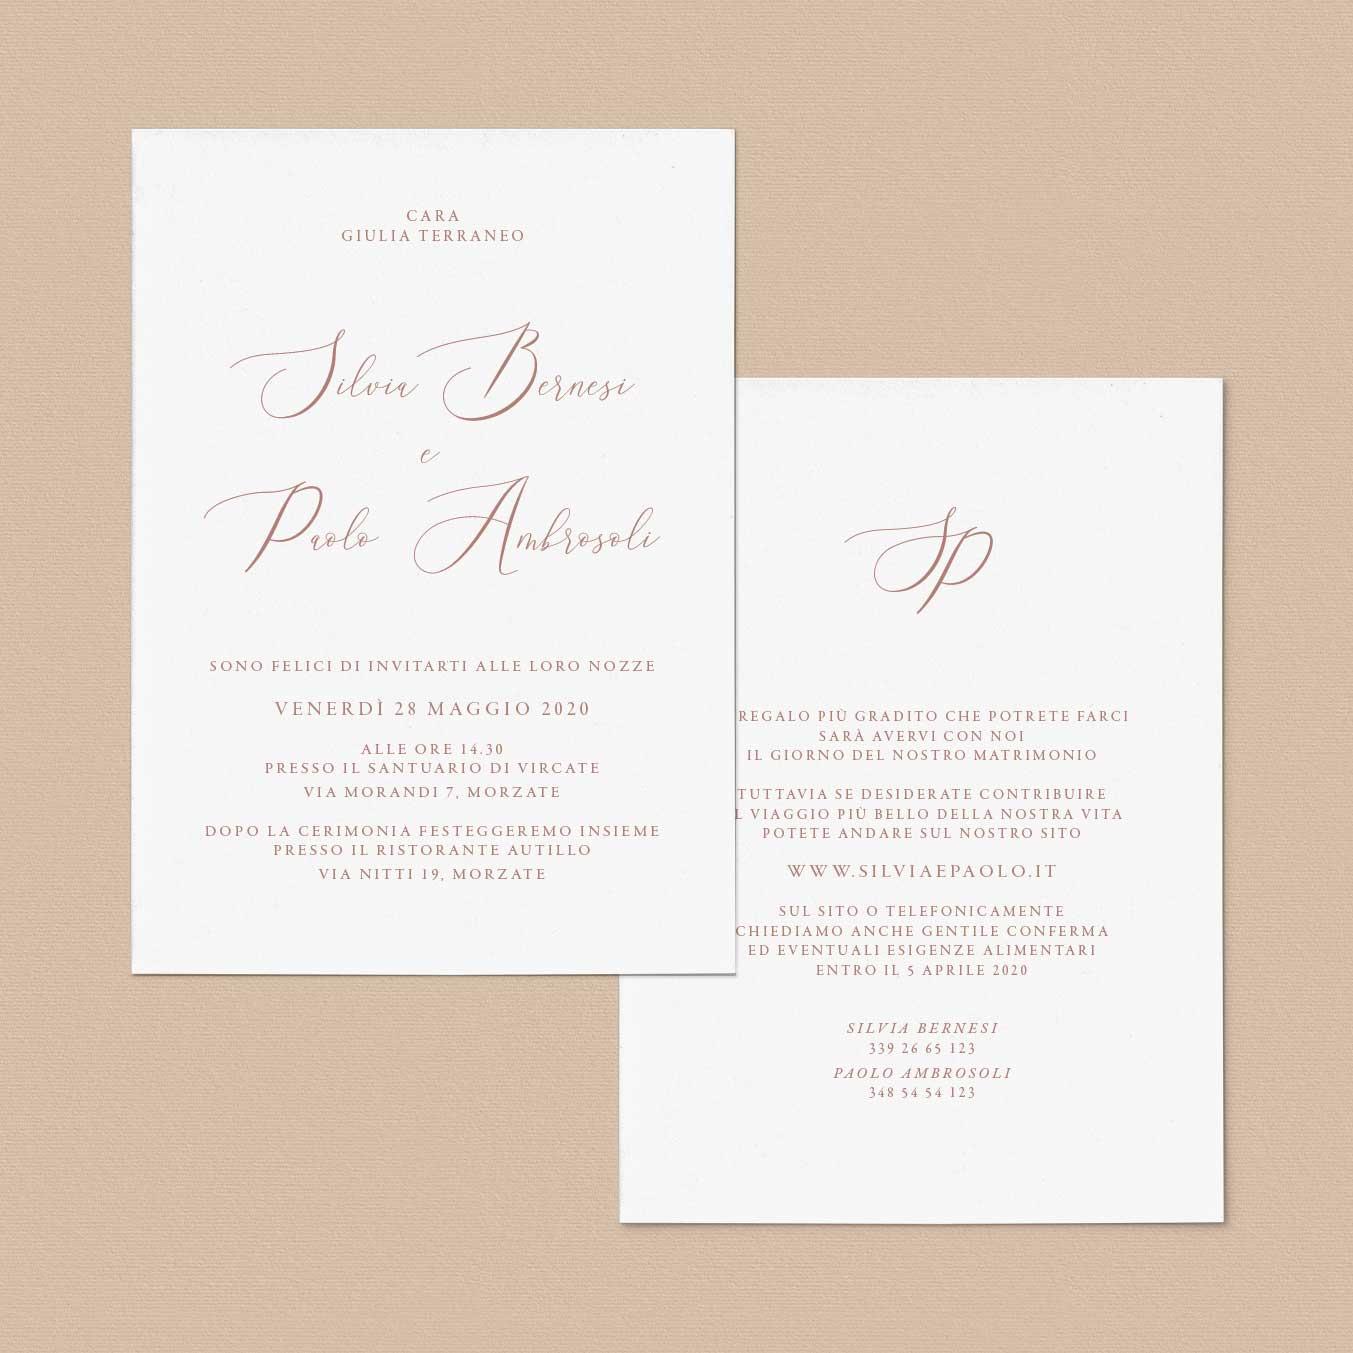 Partecipazioni-matrimonio-inviti-nozze-eleganti-elegante-raffinate-idee-fai-da-te-grafica-semplici-romantiche-romantic-elegant-online